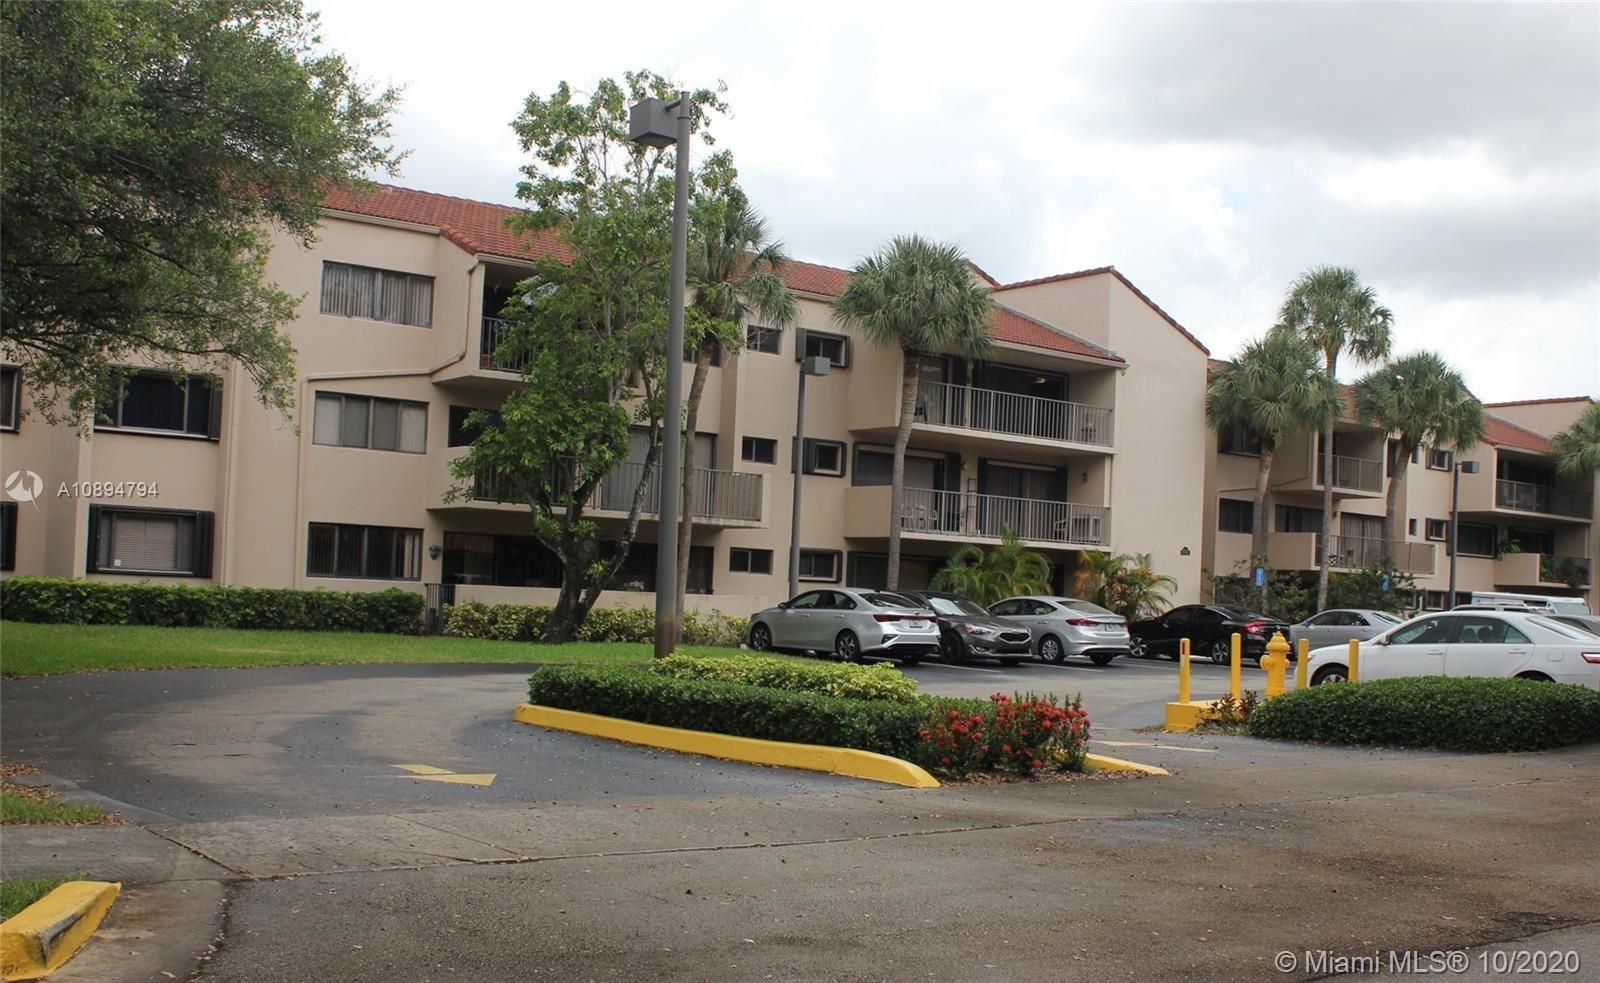 6305 Gage Pl #204-A, Miami Lakes, FL 33014 - #: A10894794